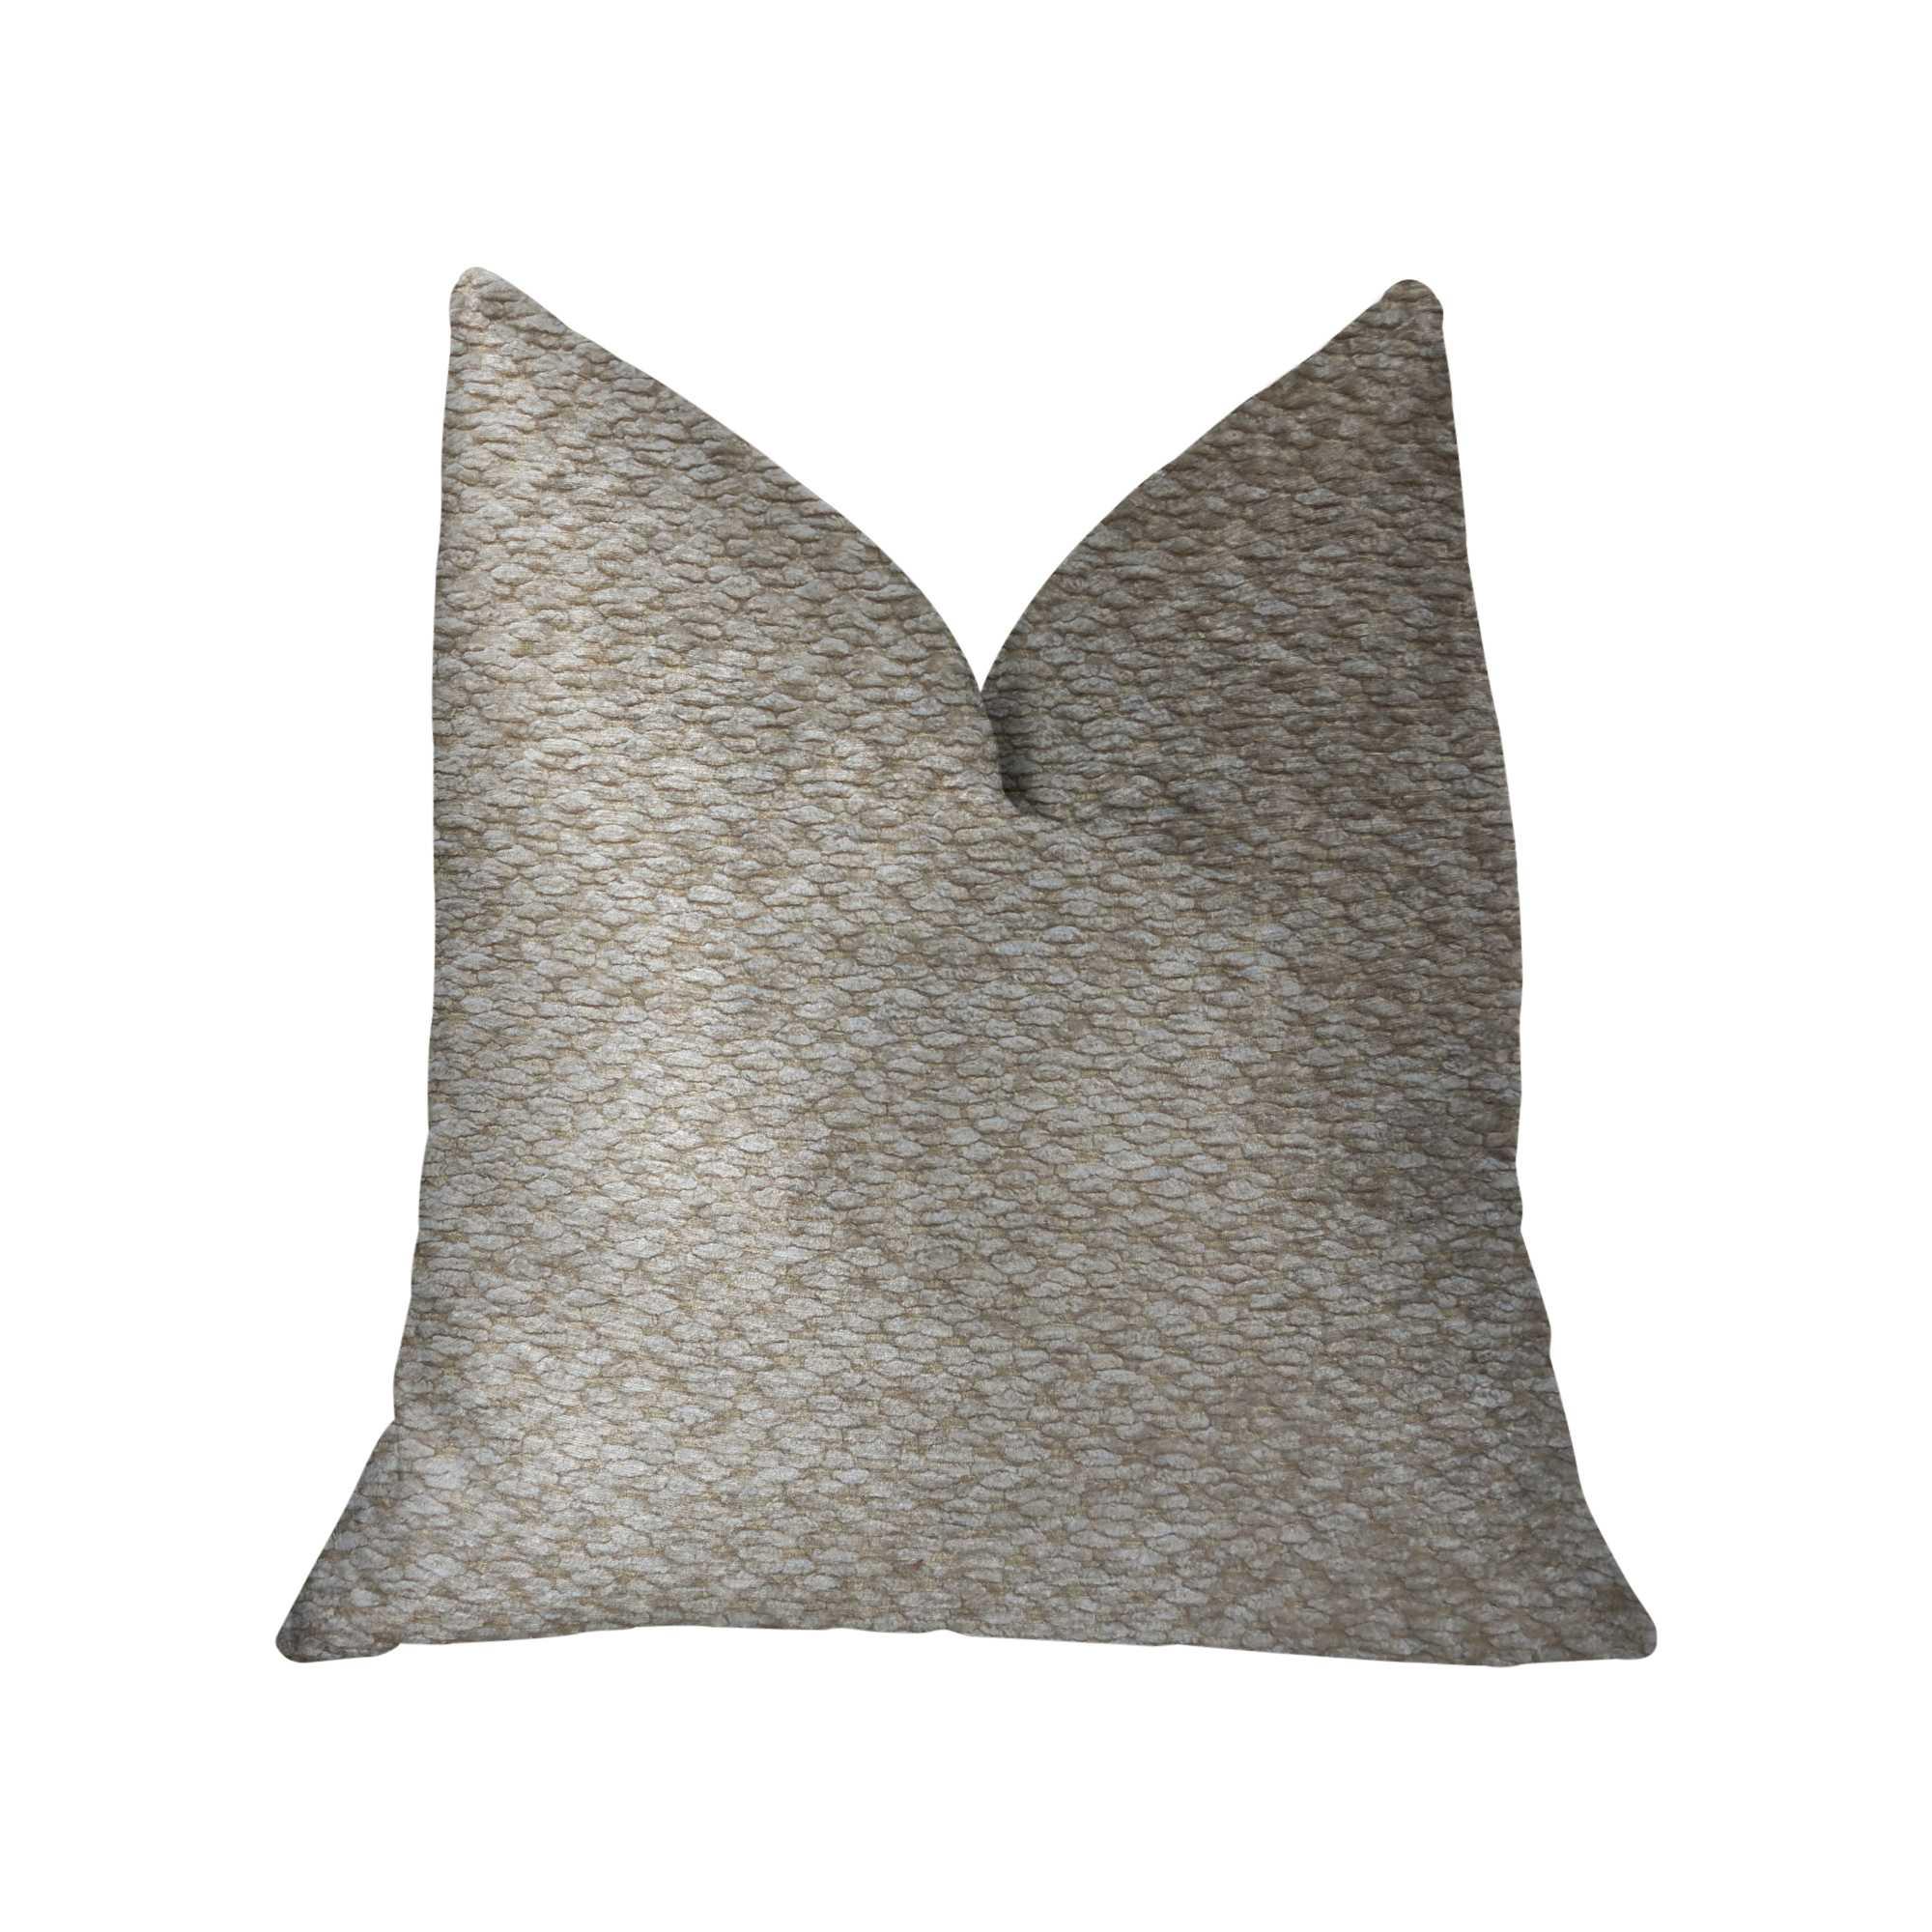 Beige Luxury Throw Pillow 12in x 20in